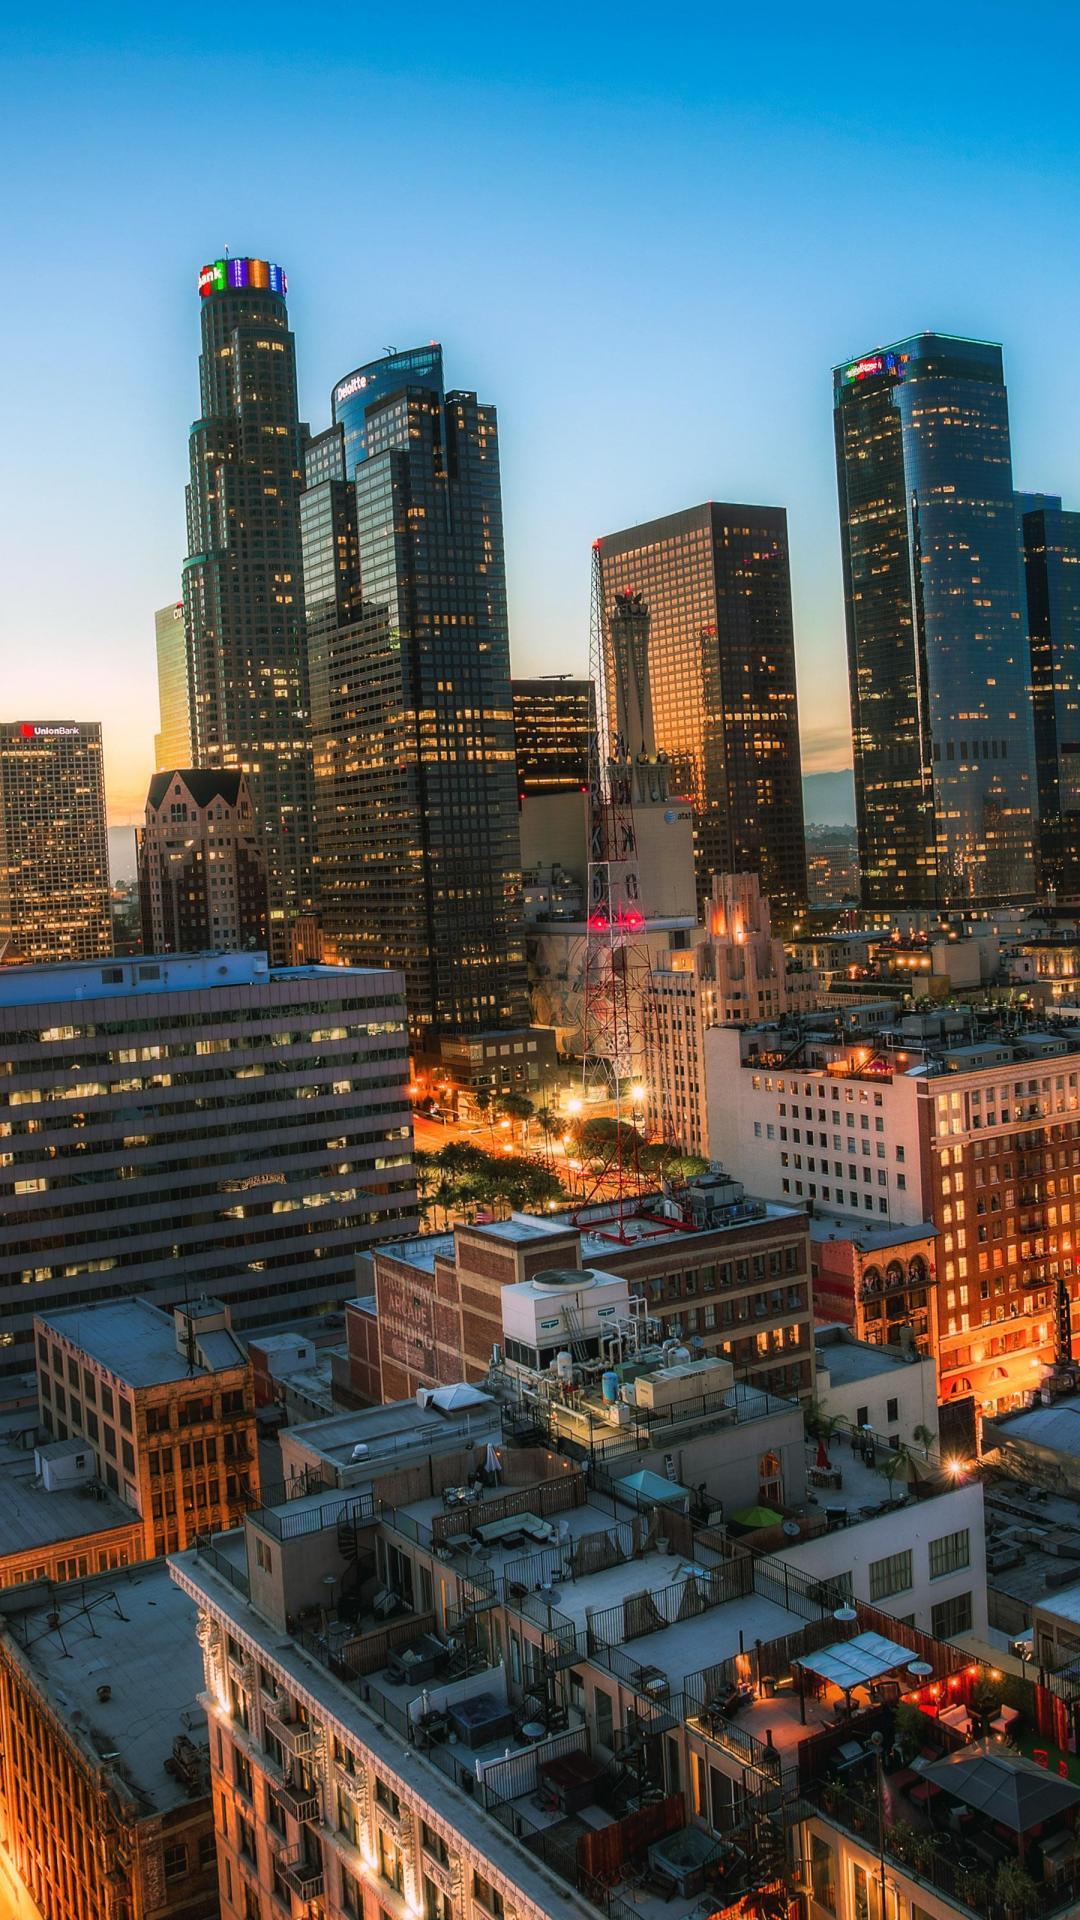 Los-angeles-california-night-iPhone-Wallpaper - iPhone ... |Los Angeles City Phone Wallpaper